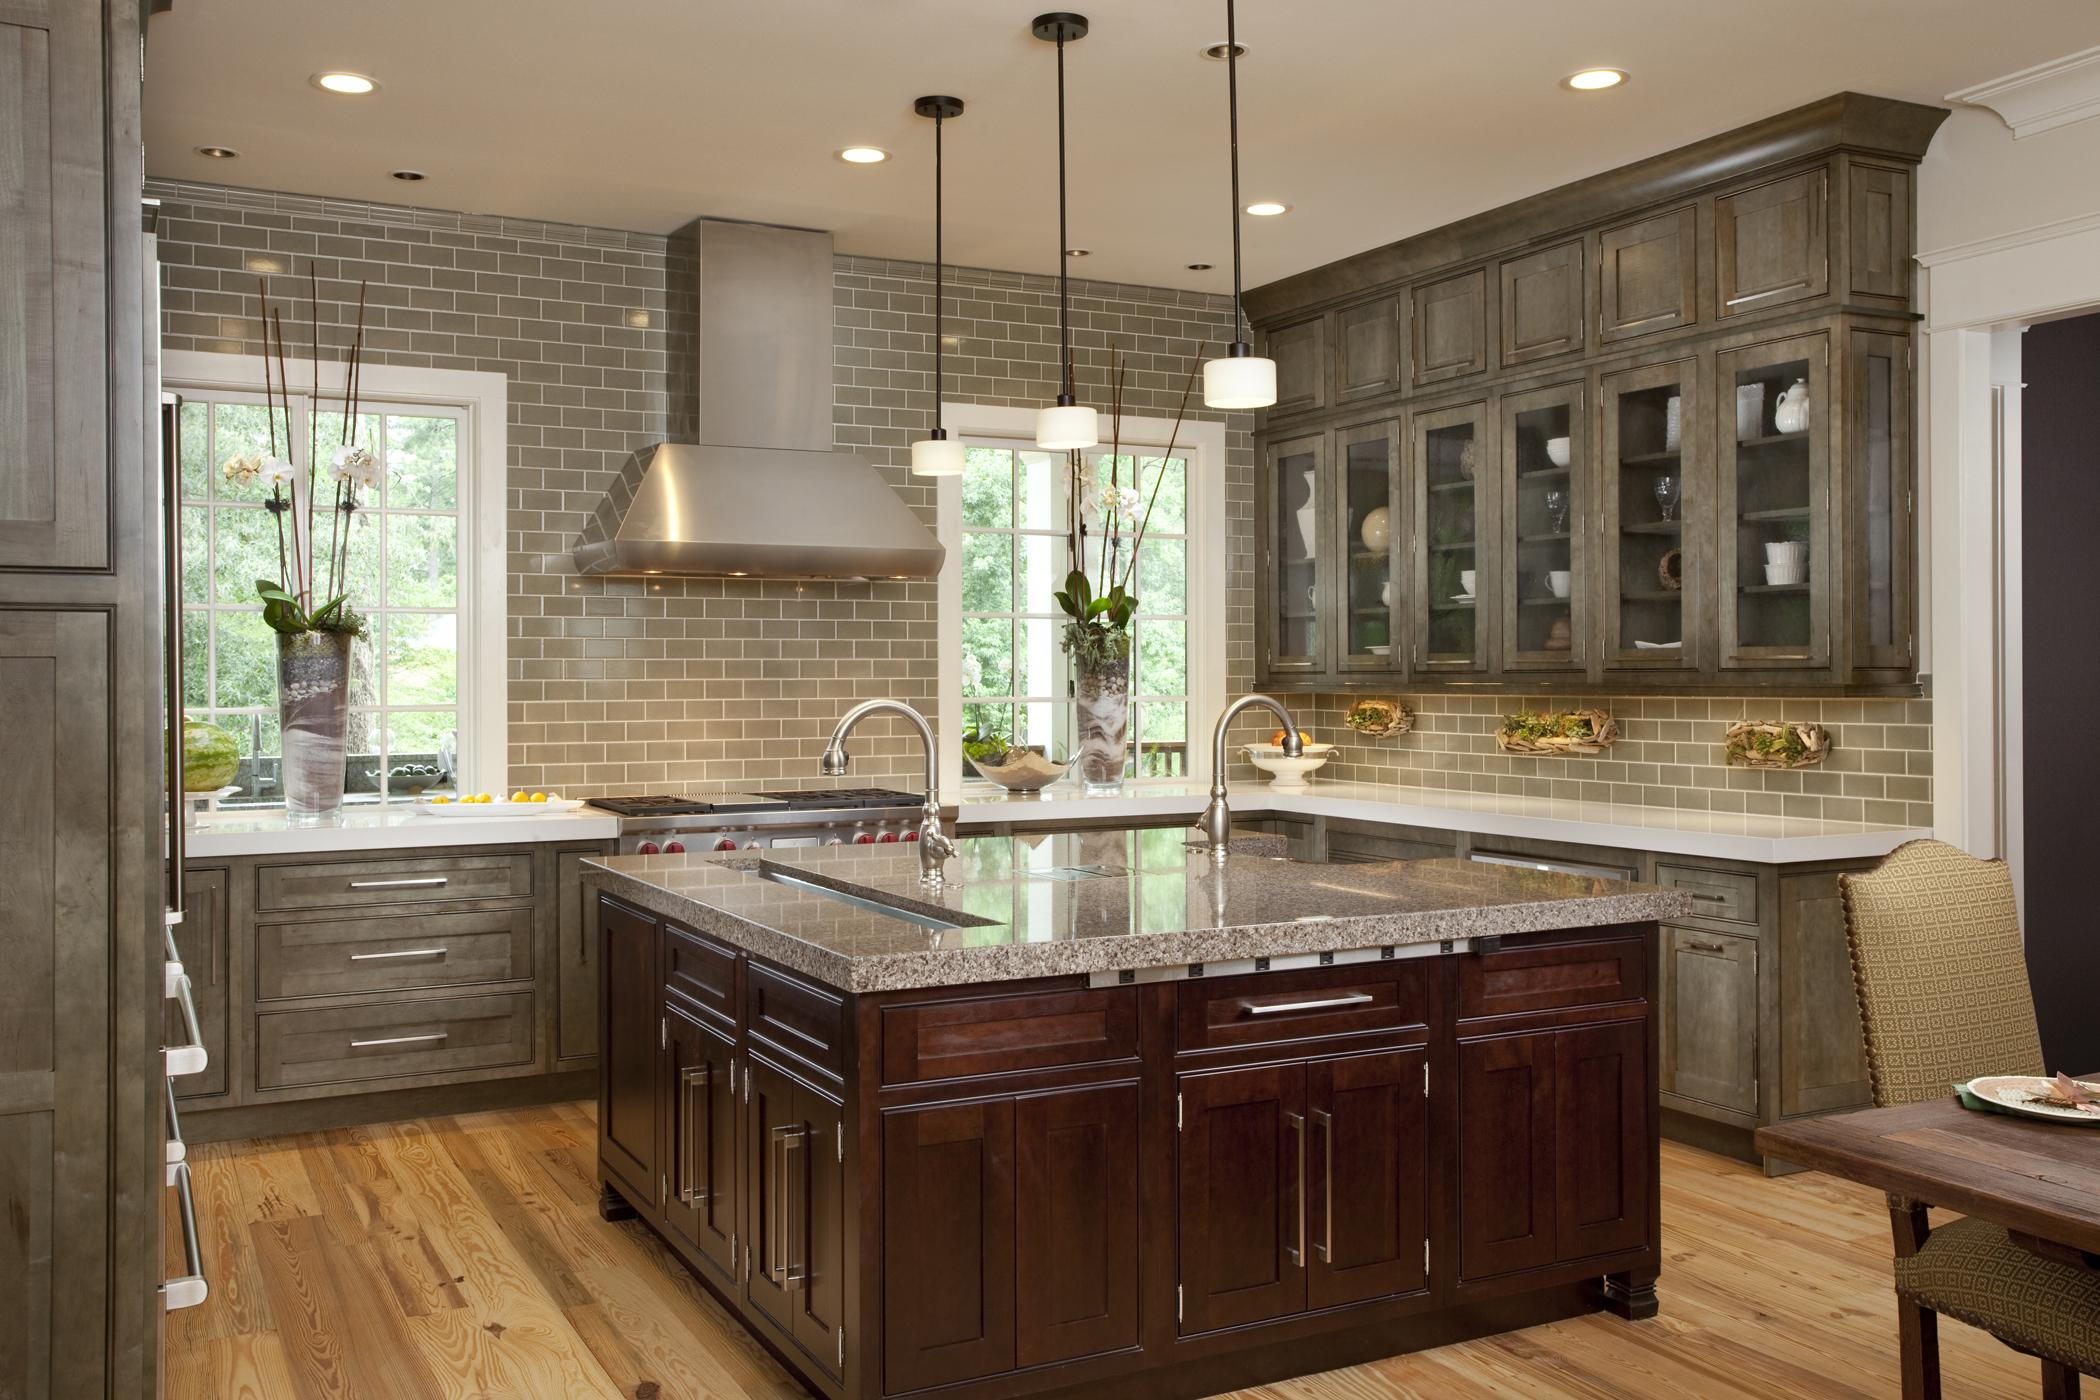 Pressroom - Wellborn Cabinet, Inc. Introduces Inset Door Styles to ...